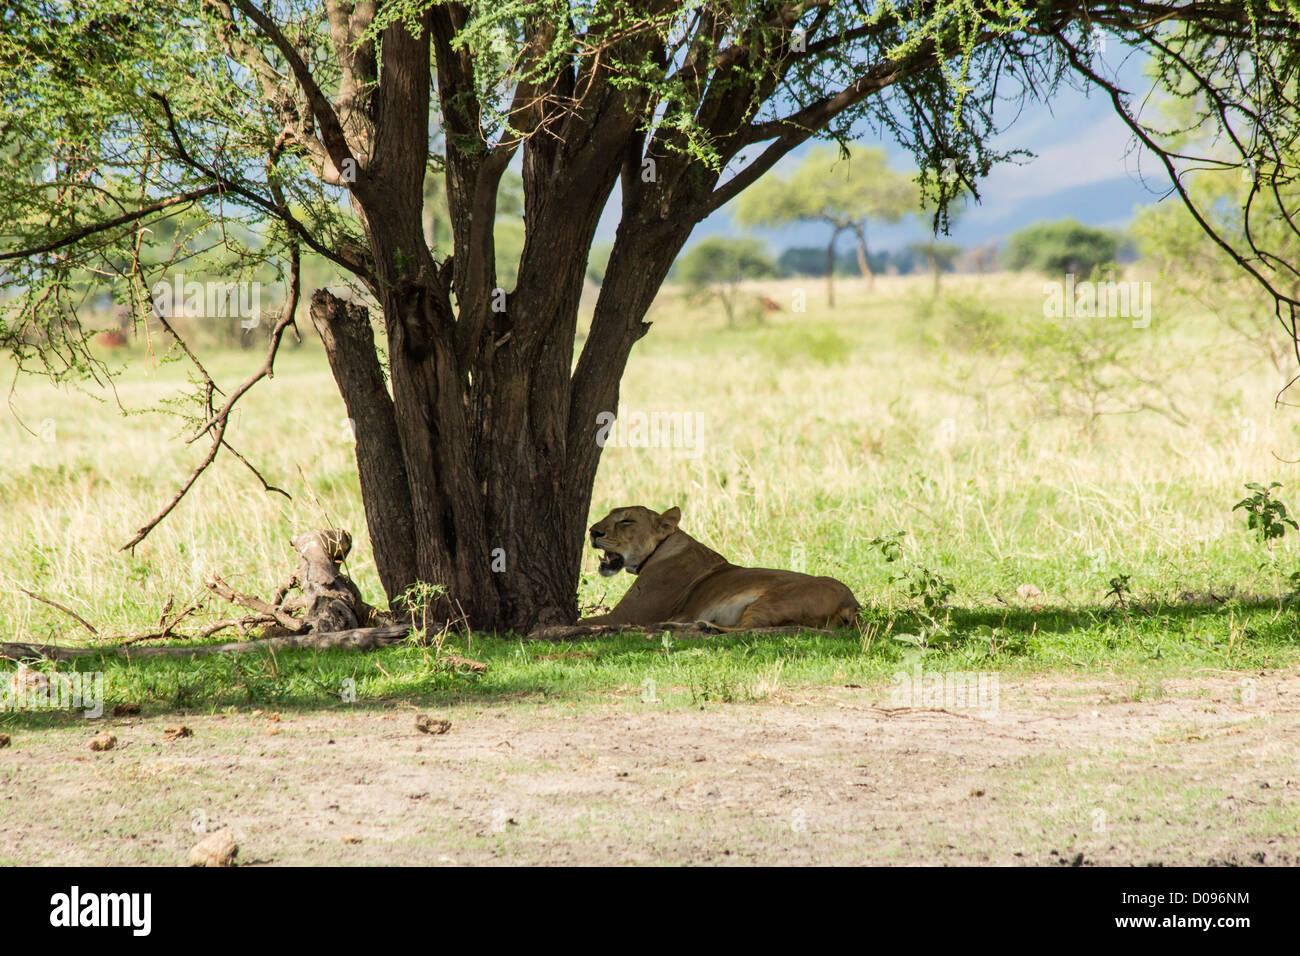 African female lion, Tarangire National Park, Tanzania, Africa - Stock Image